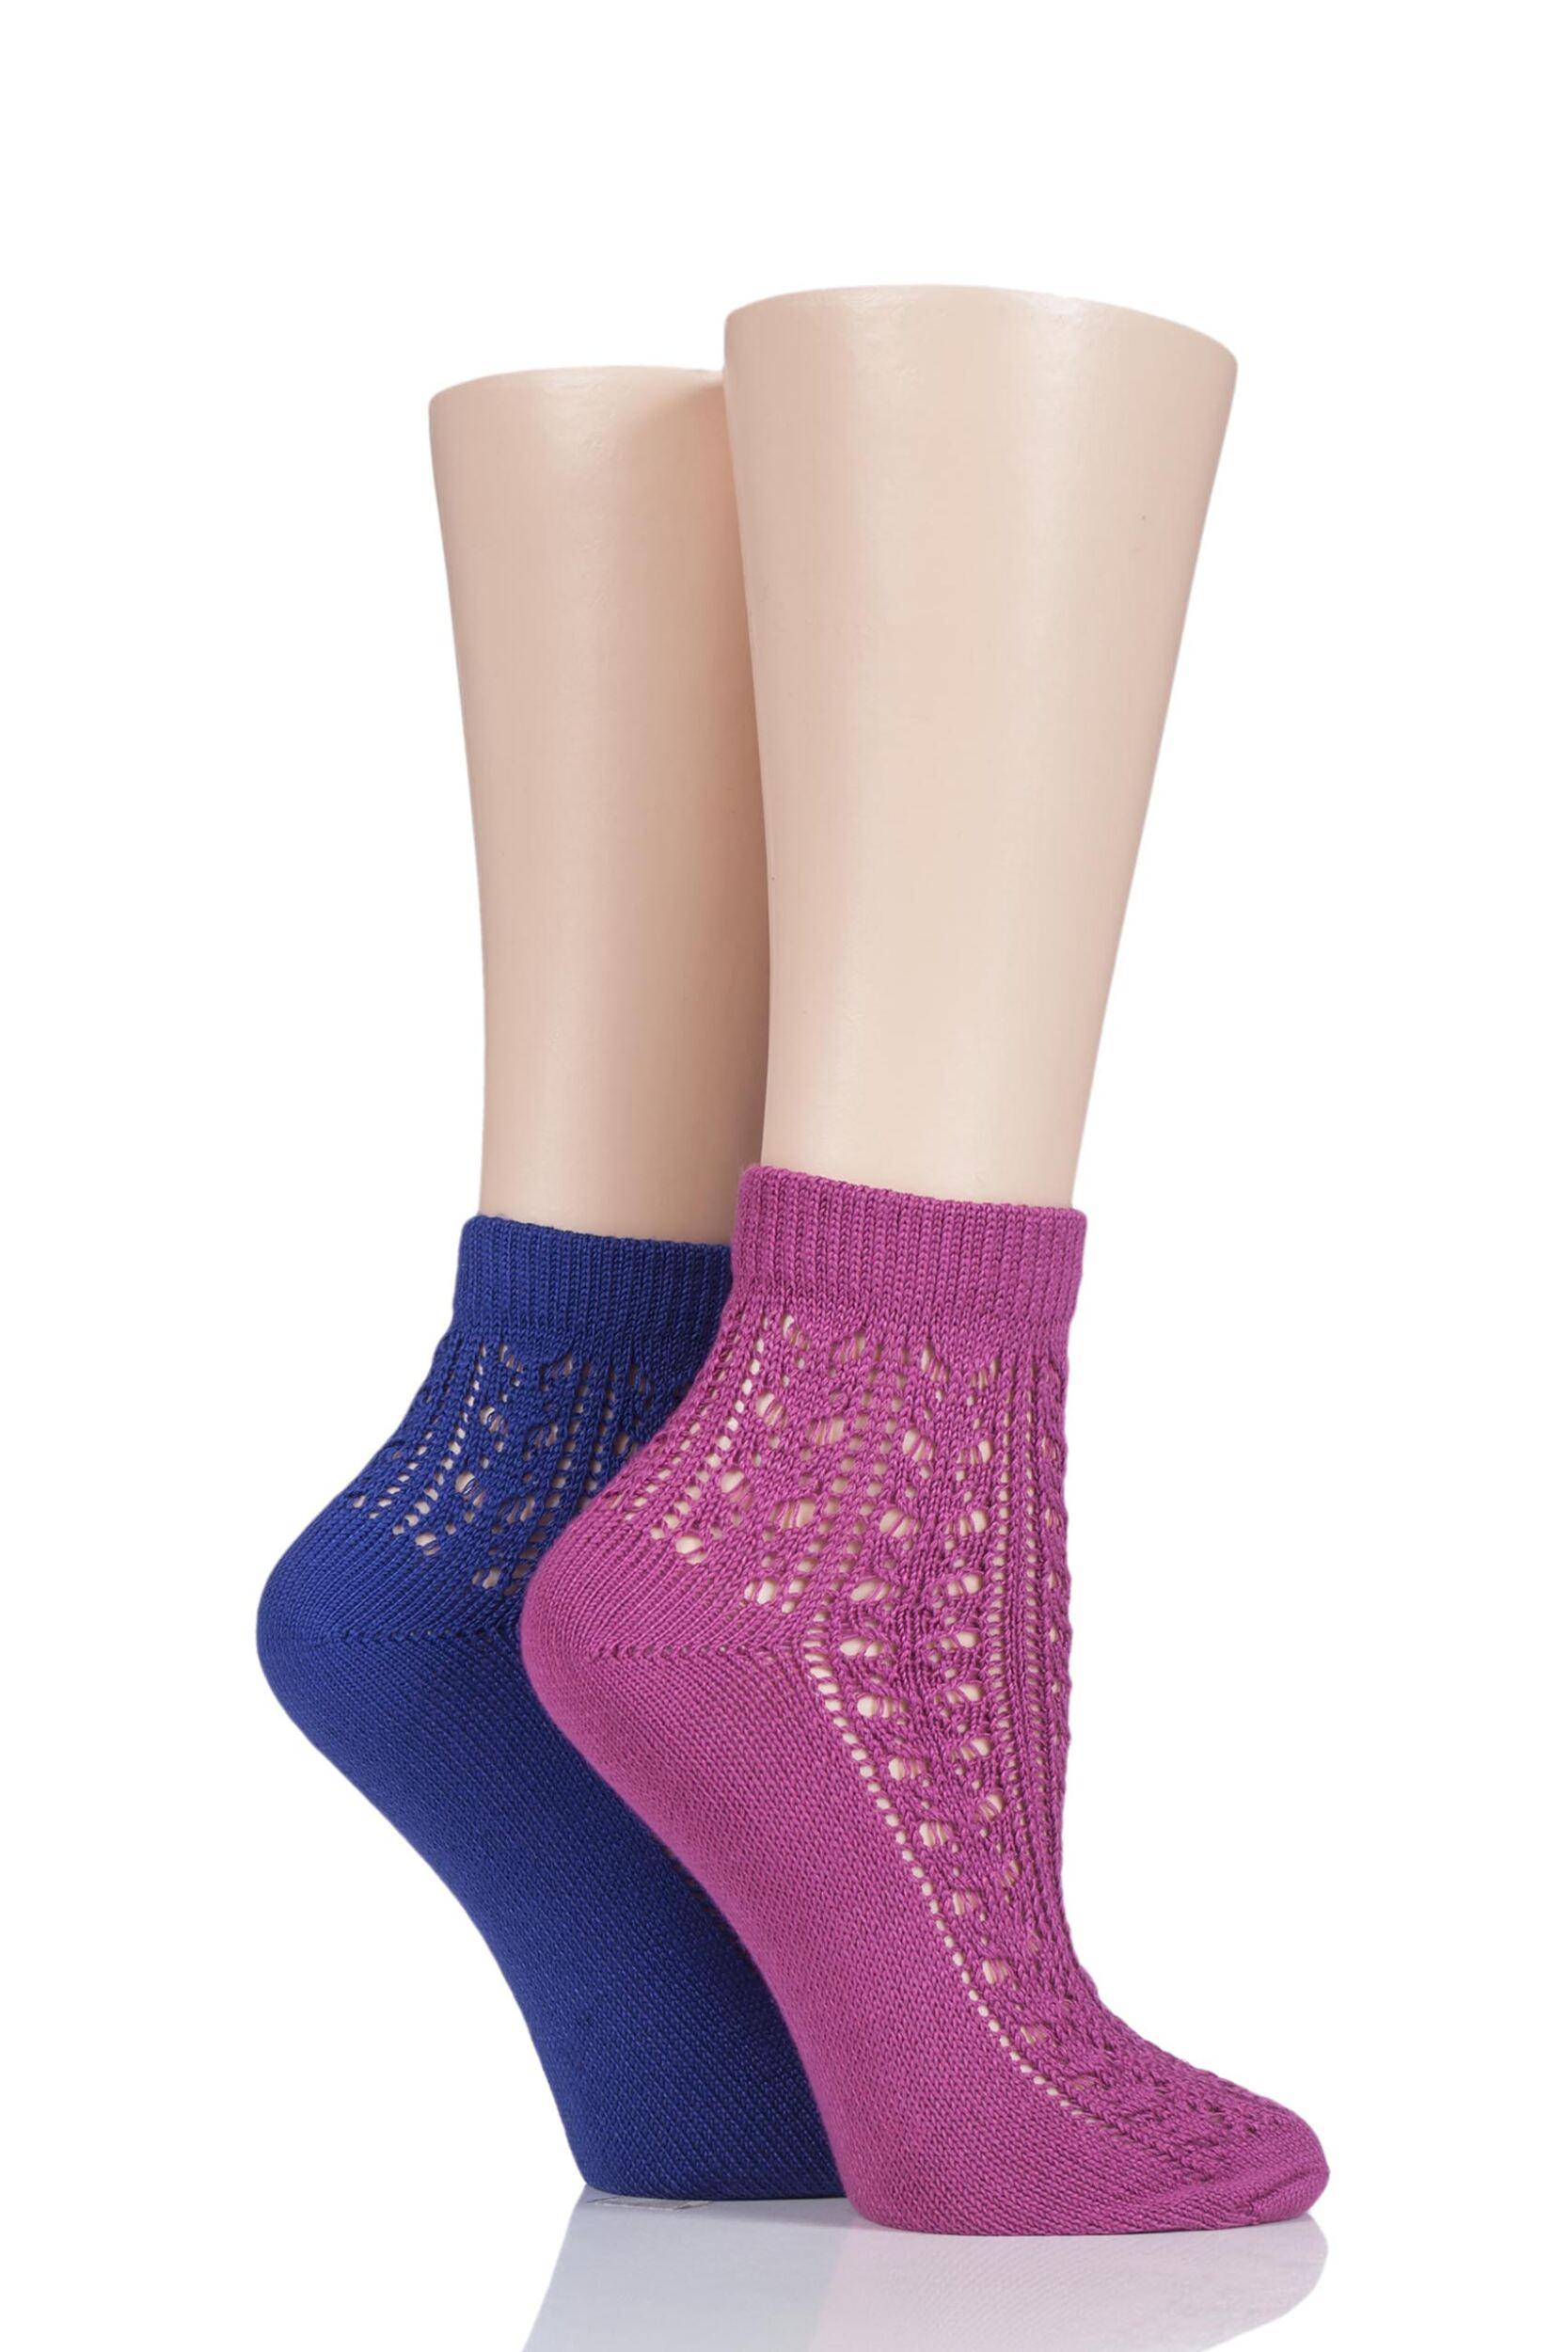 Ladies-2-Pair-Elle-Dainty-and-Delicate-Soft-Pelerine-Anklets